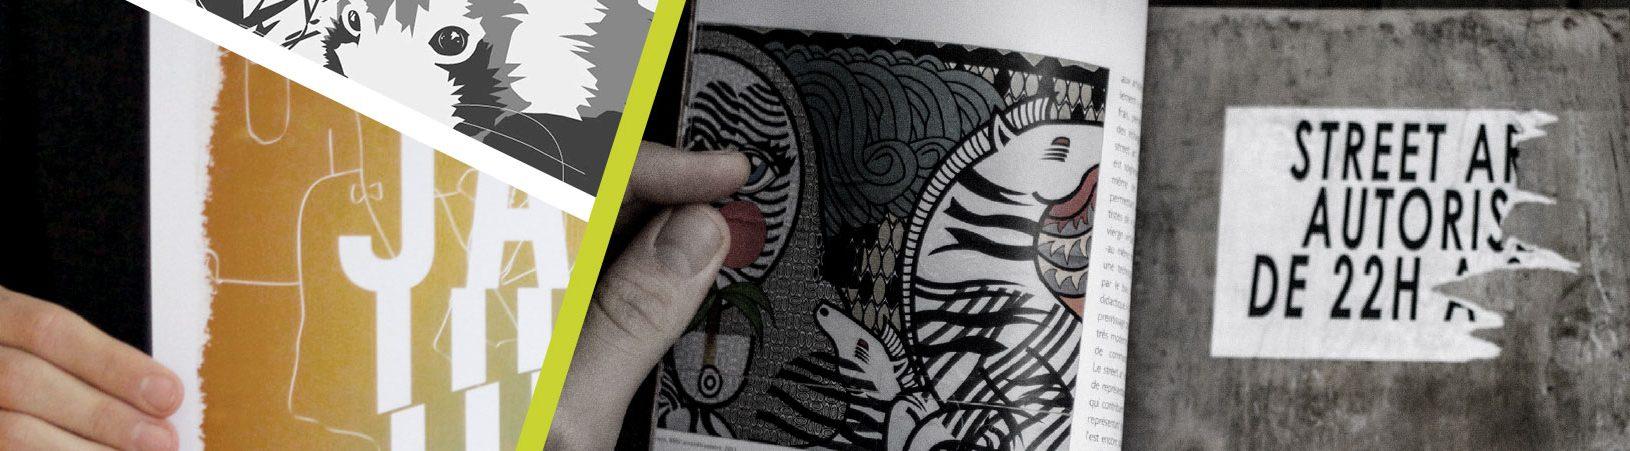 formation multimédia print paris - comart-design